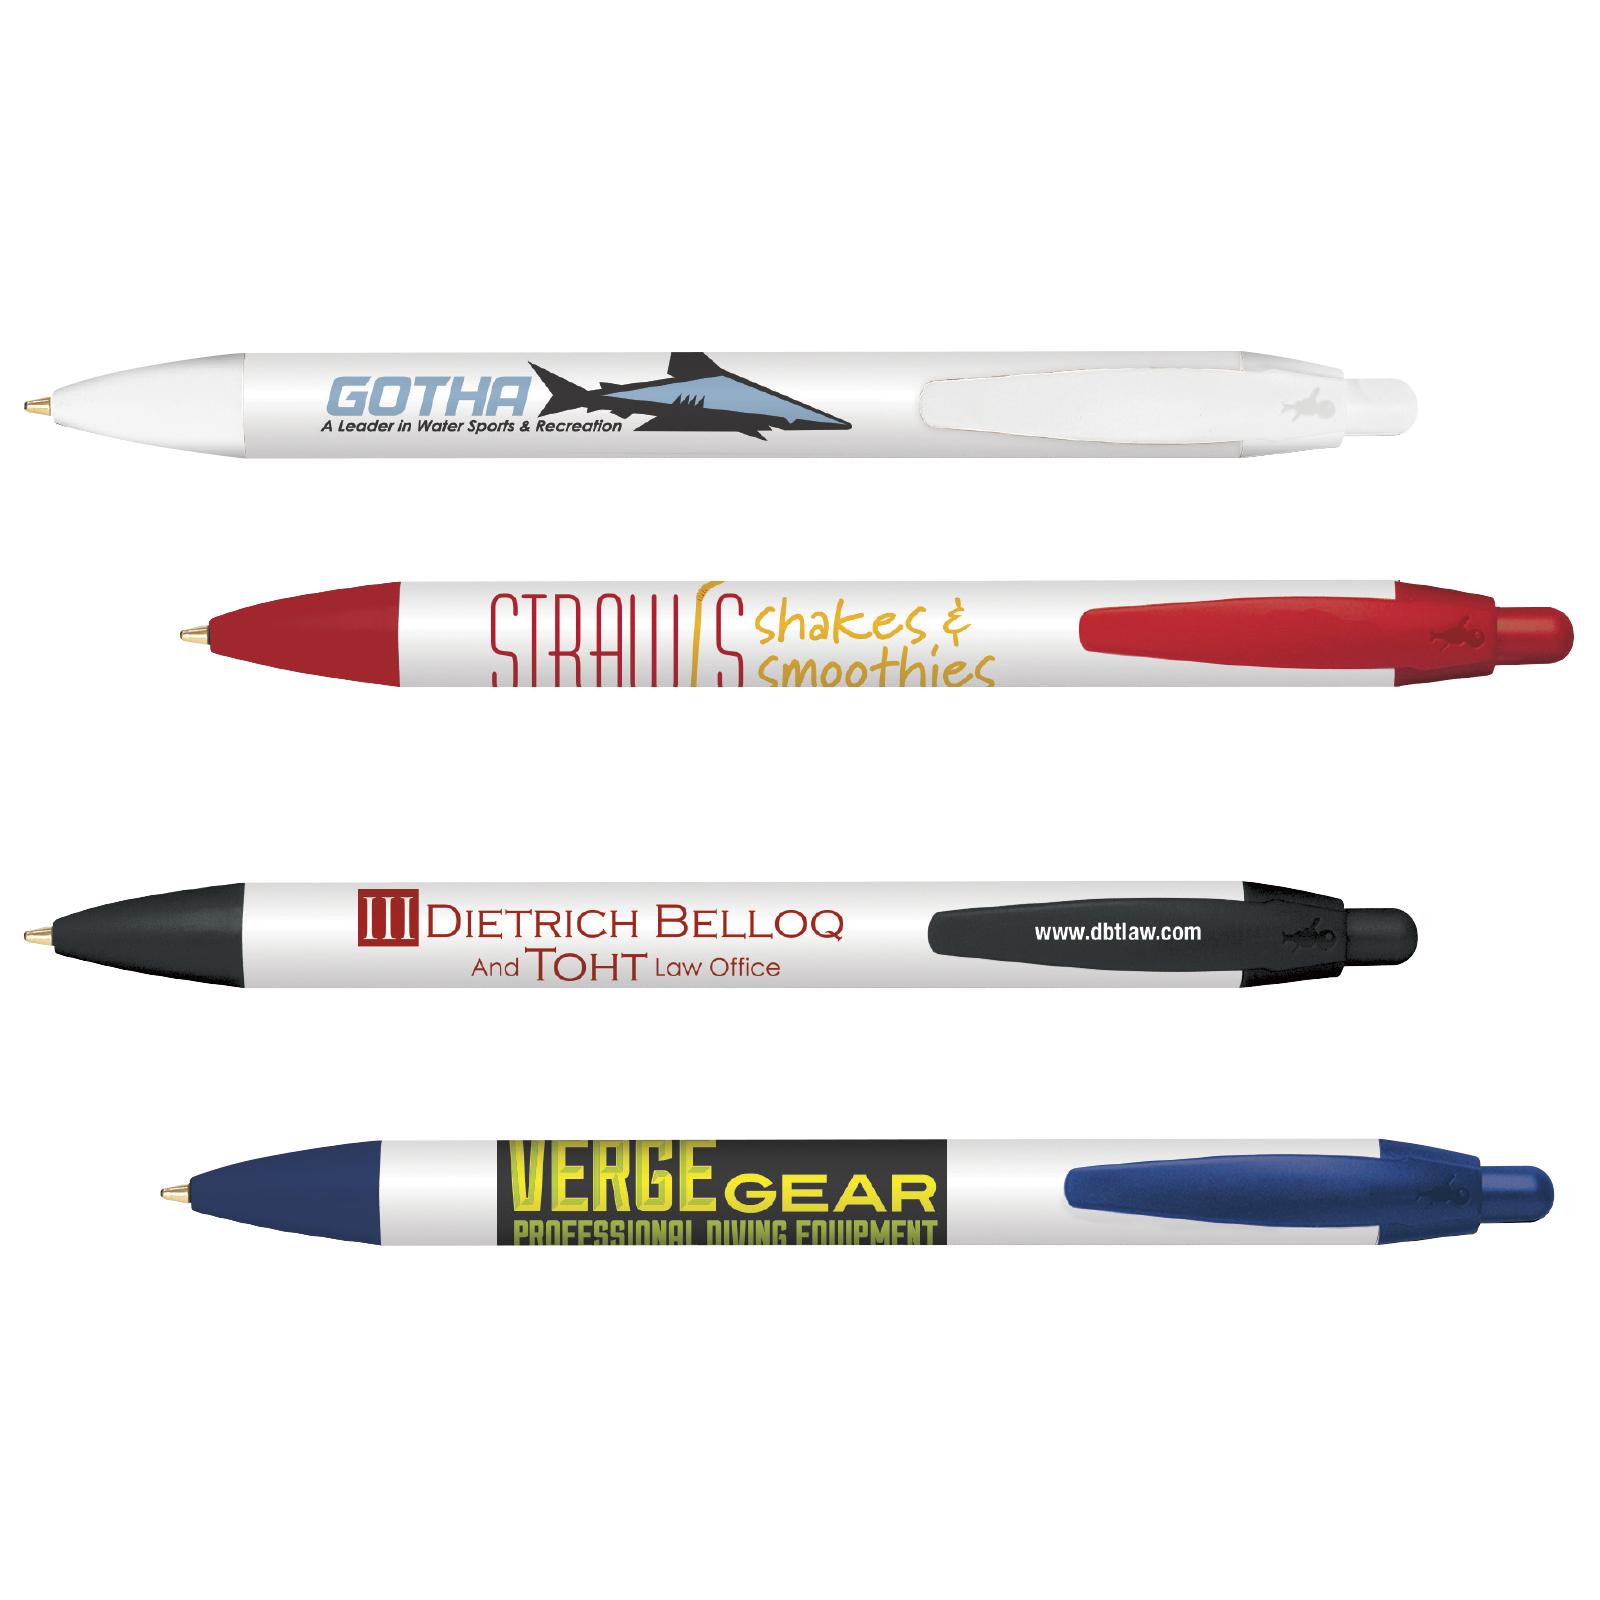 promotional bic widebody value pen